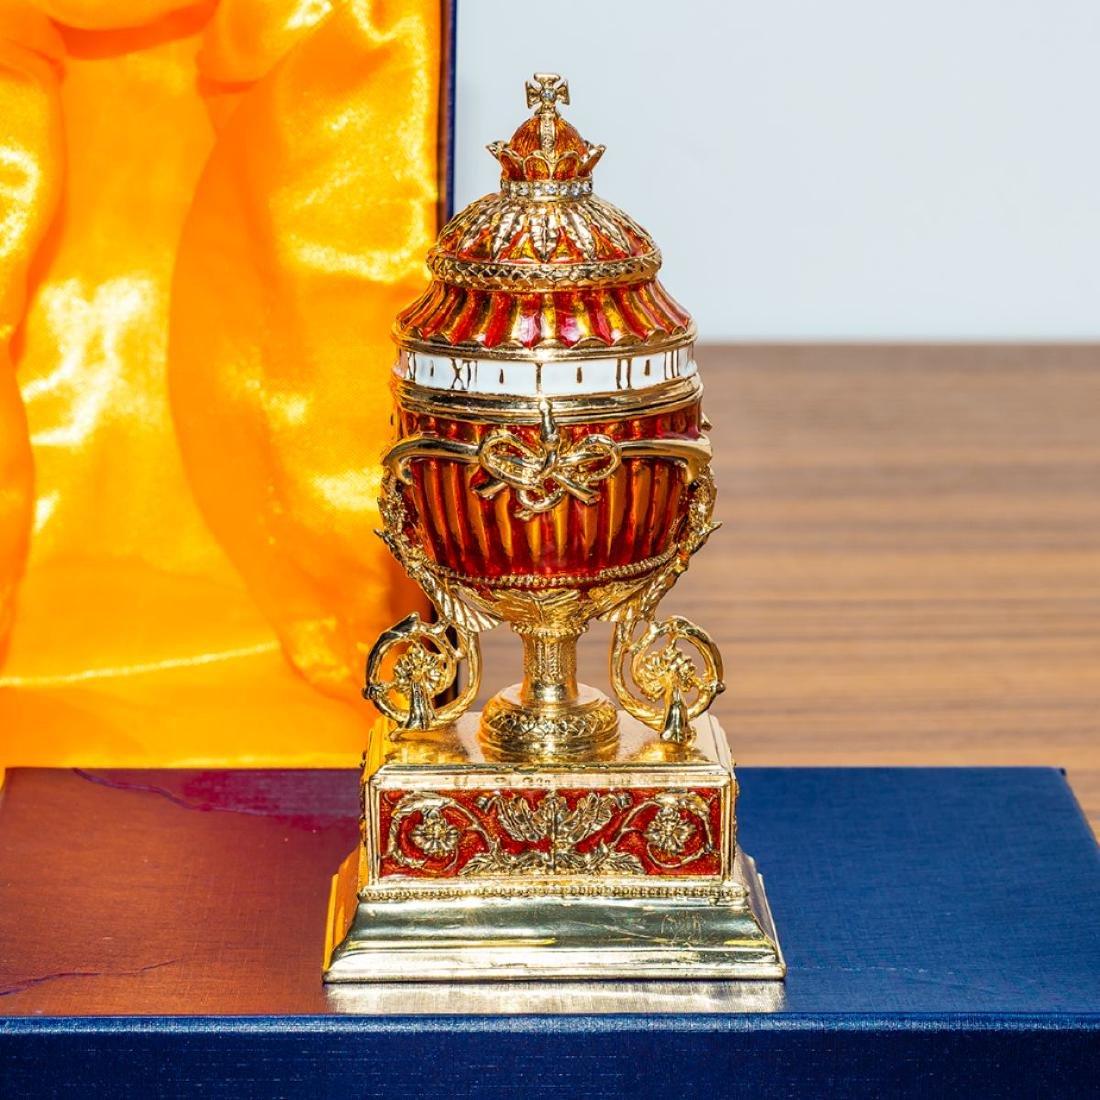 1899 Bouquet of Lilies Clock Royal Russian Egg